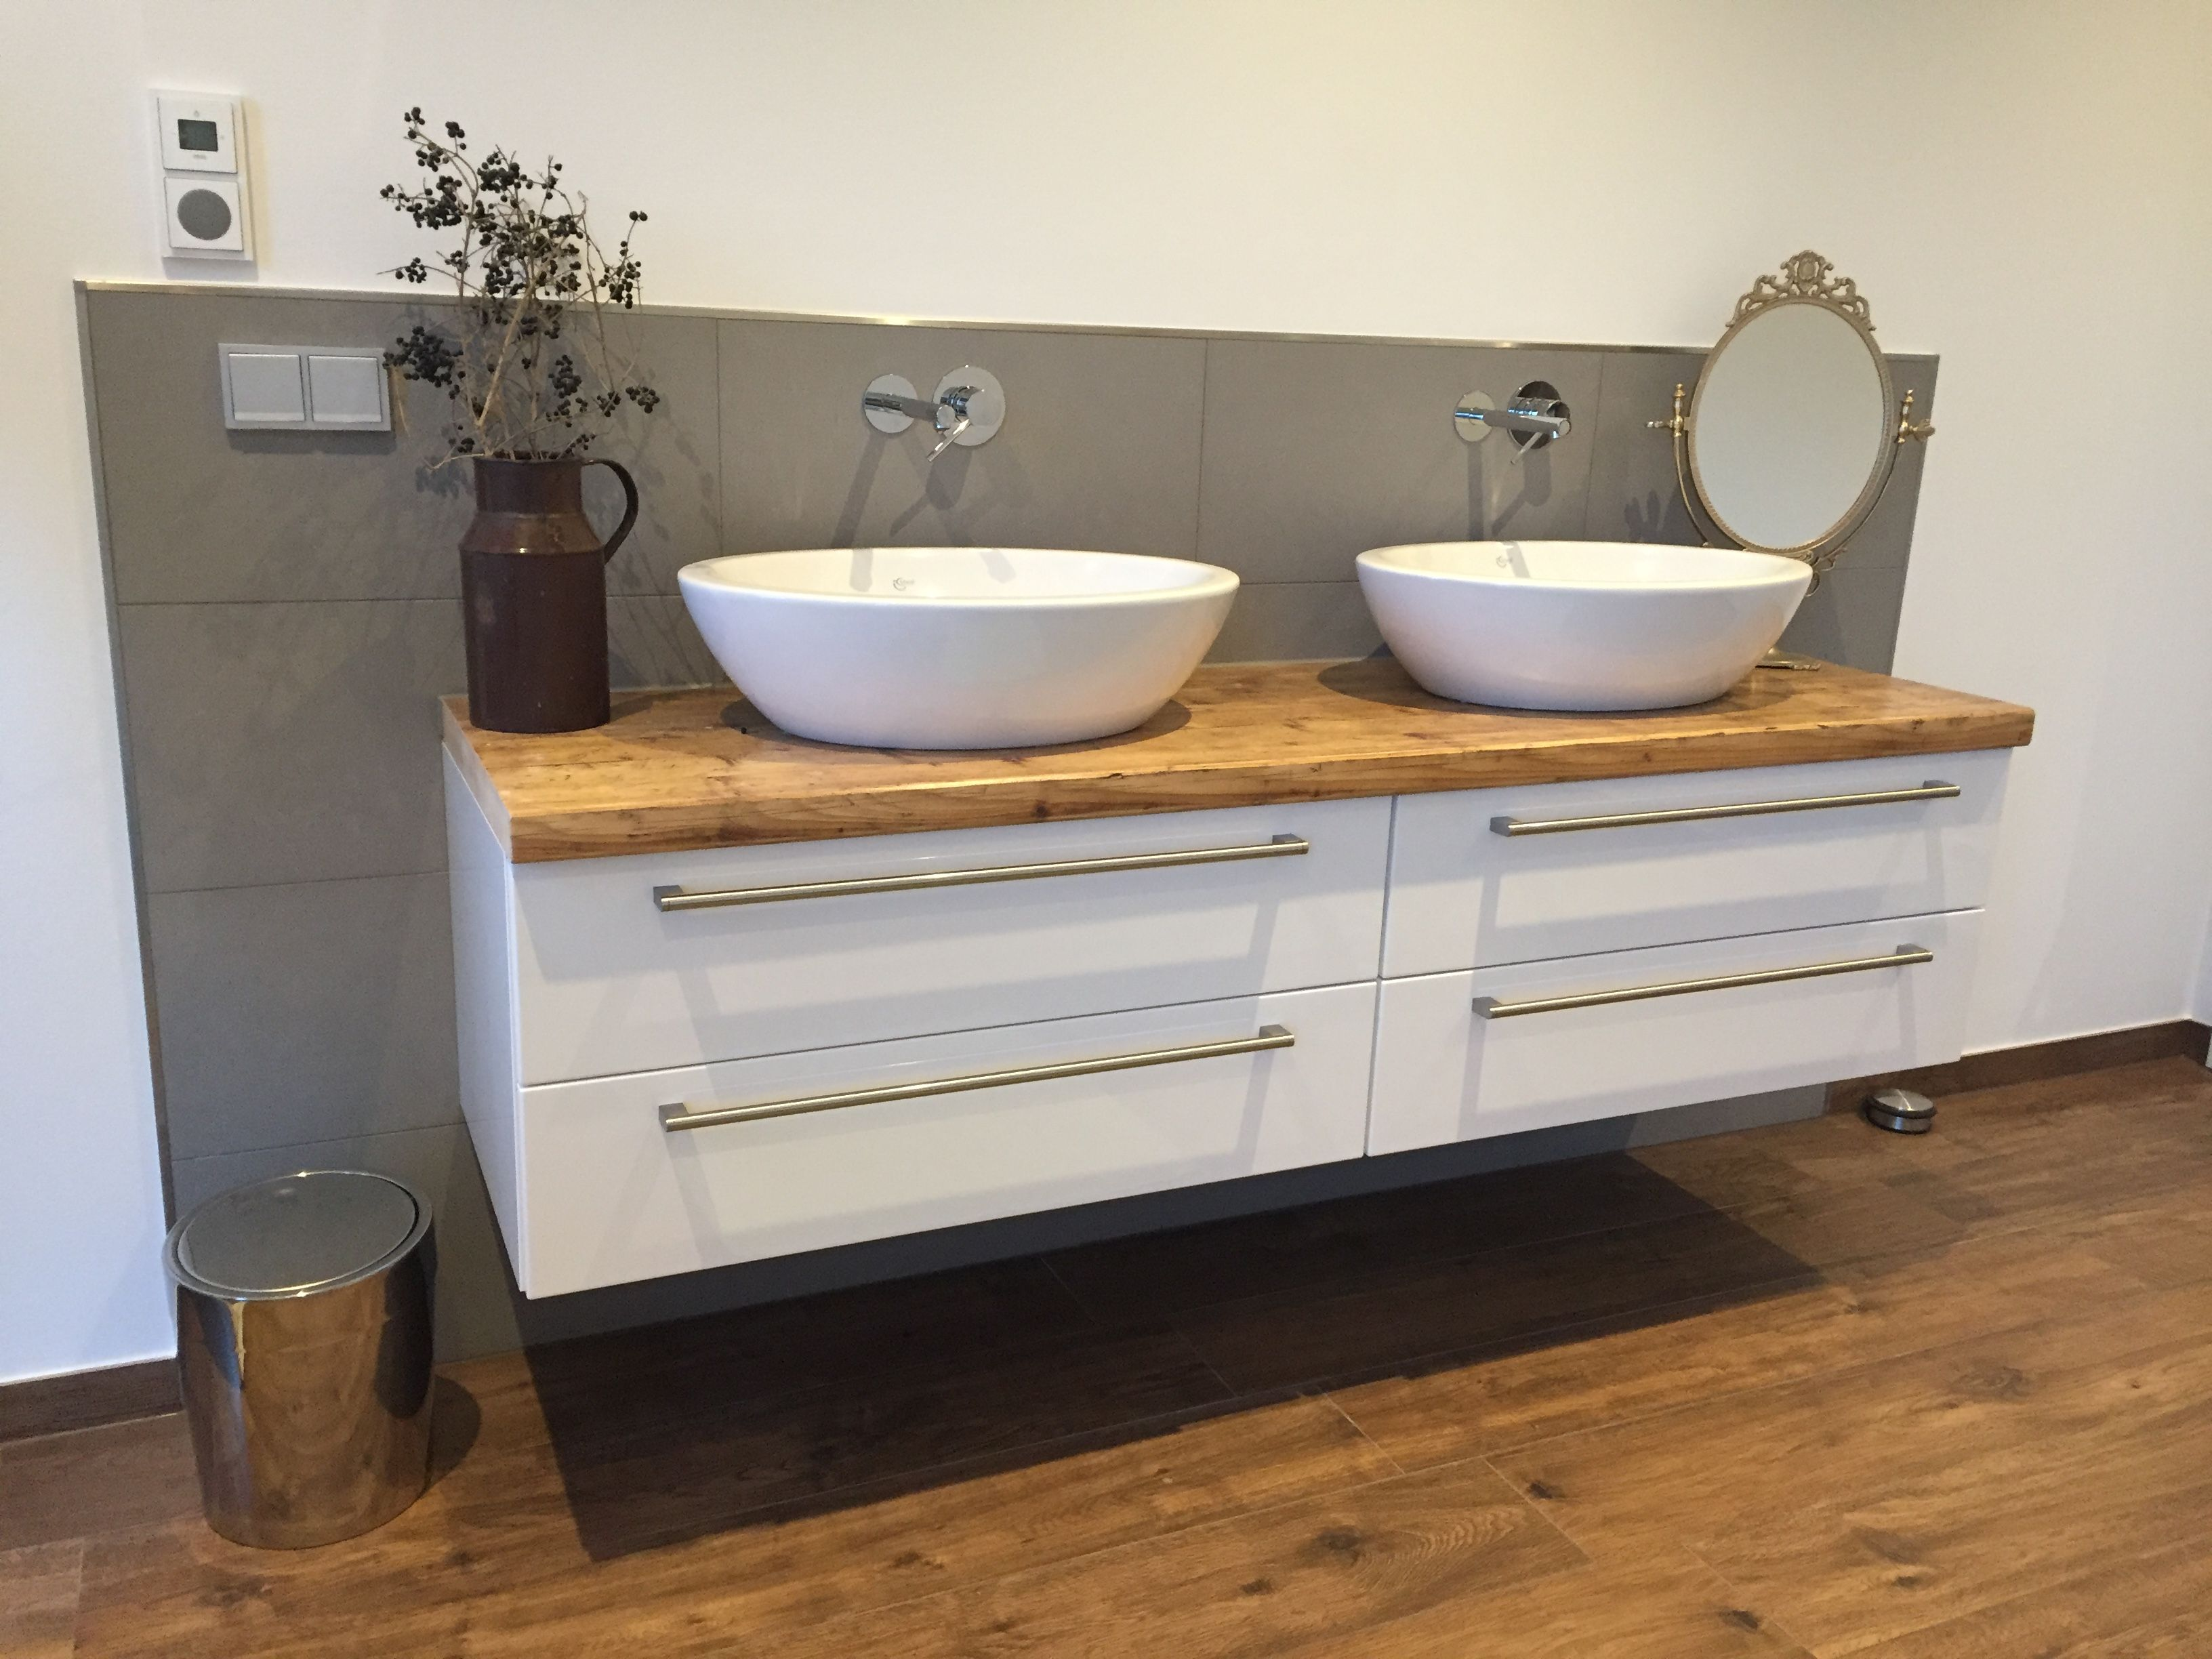 Holz Badezimmermöbel » Moderne badezimmermöbel holz gispatcher ...